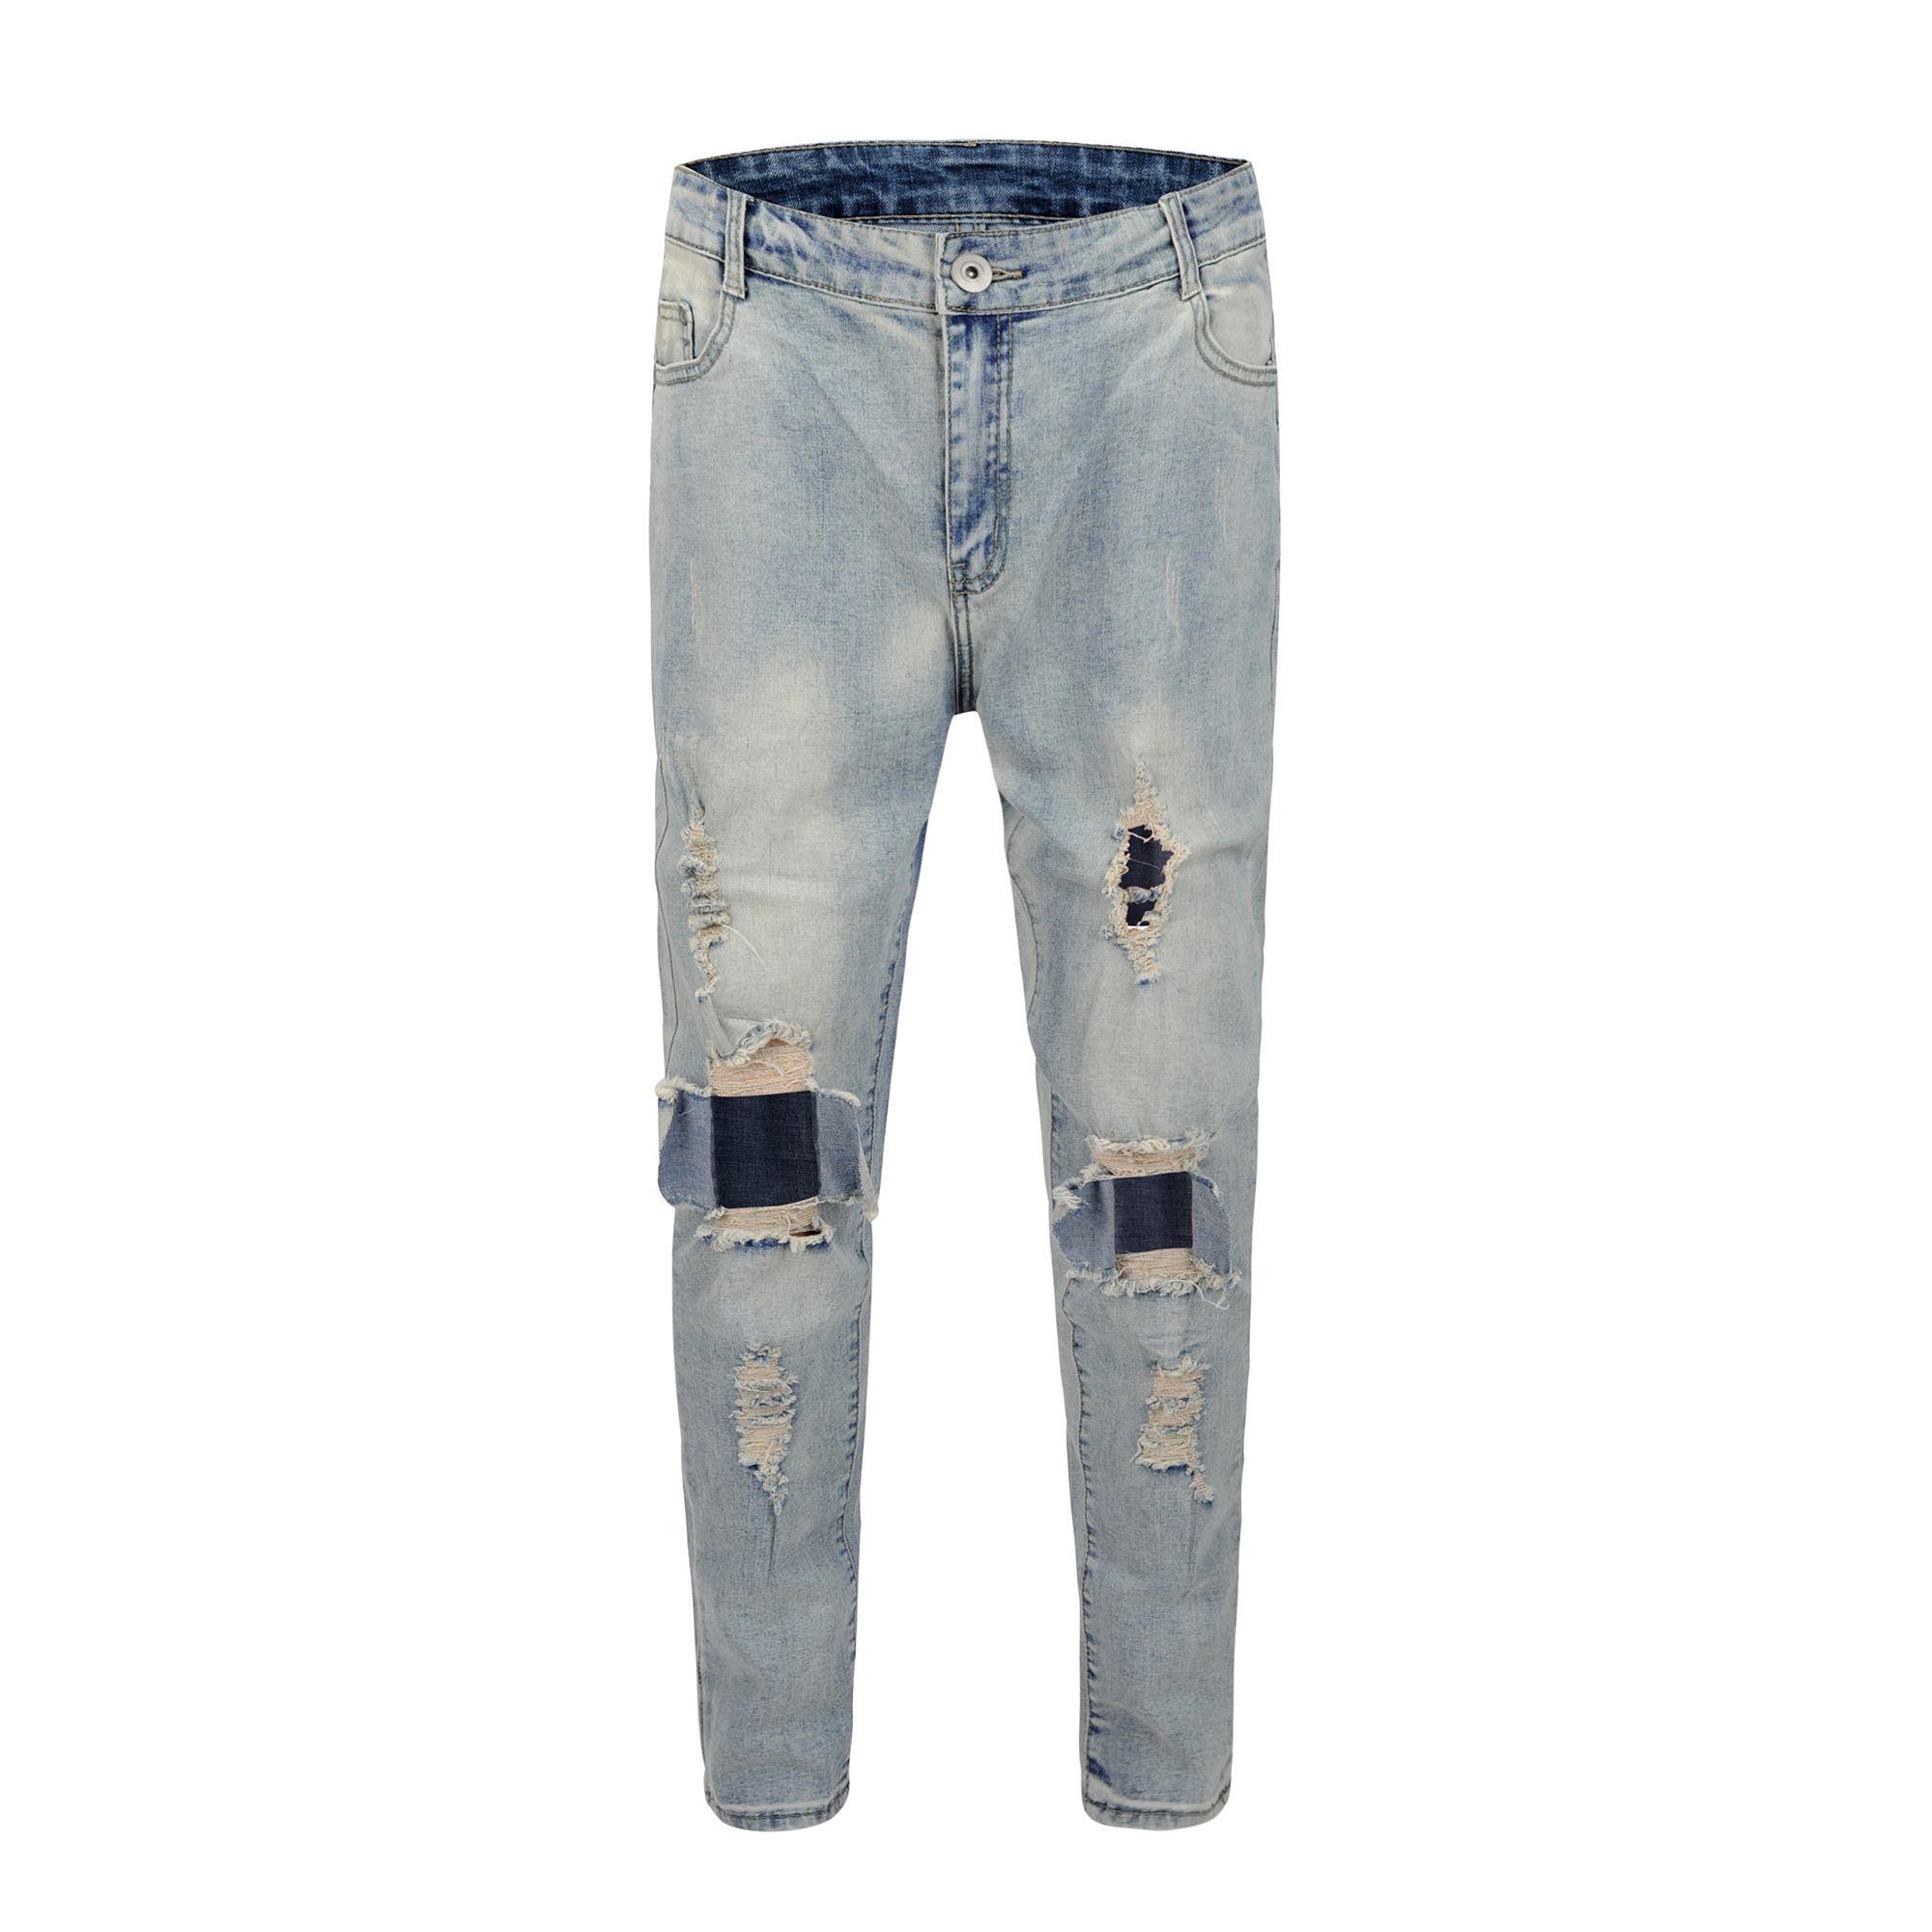 b76014e34cb2b Compre 2018 Mejor Versión RETRO DENIM BLUE Hombres Jeans Ripped Destroyed  Hombres Jeans Hip Hop Big Hole Casual Streetwear Jeans A  36.54 Del ...